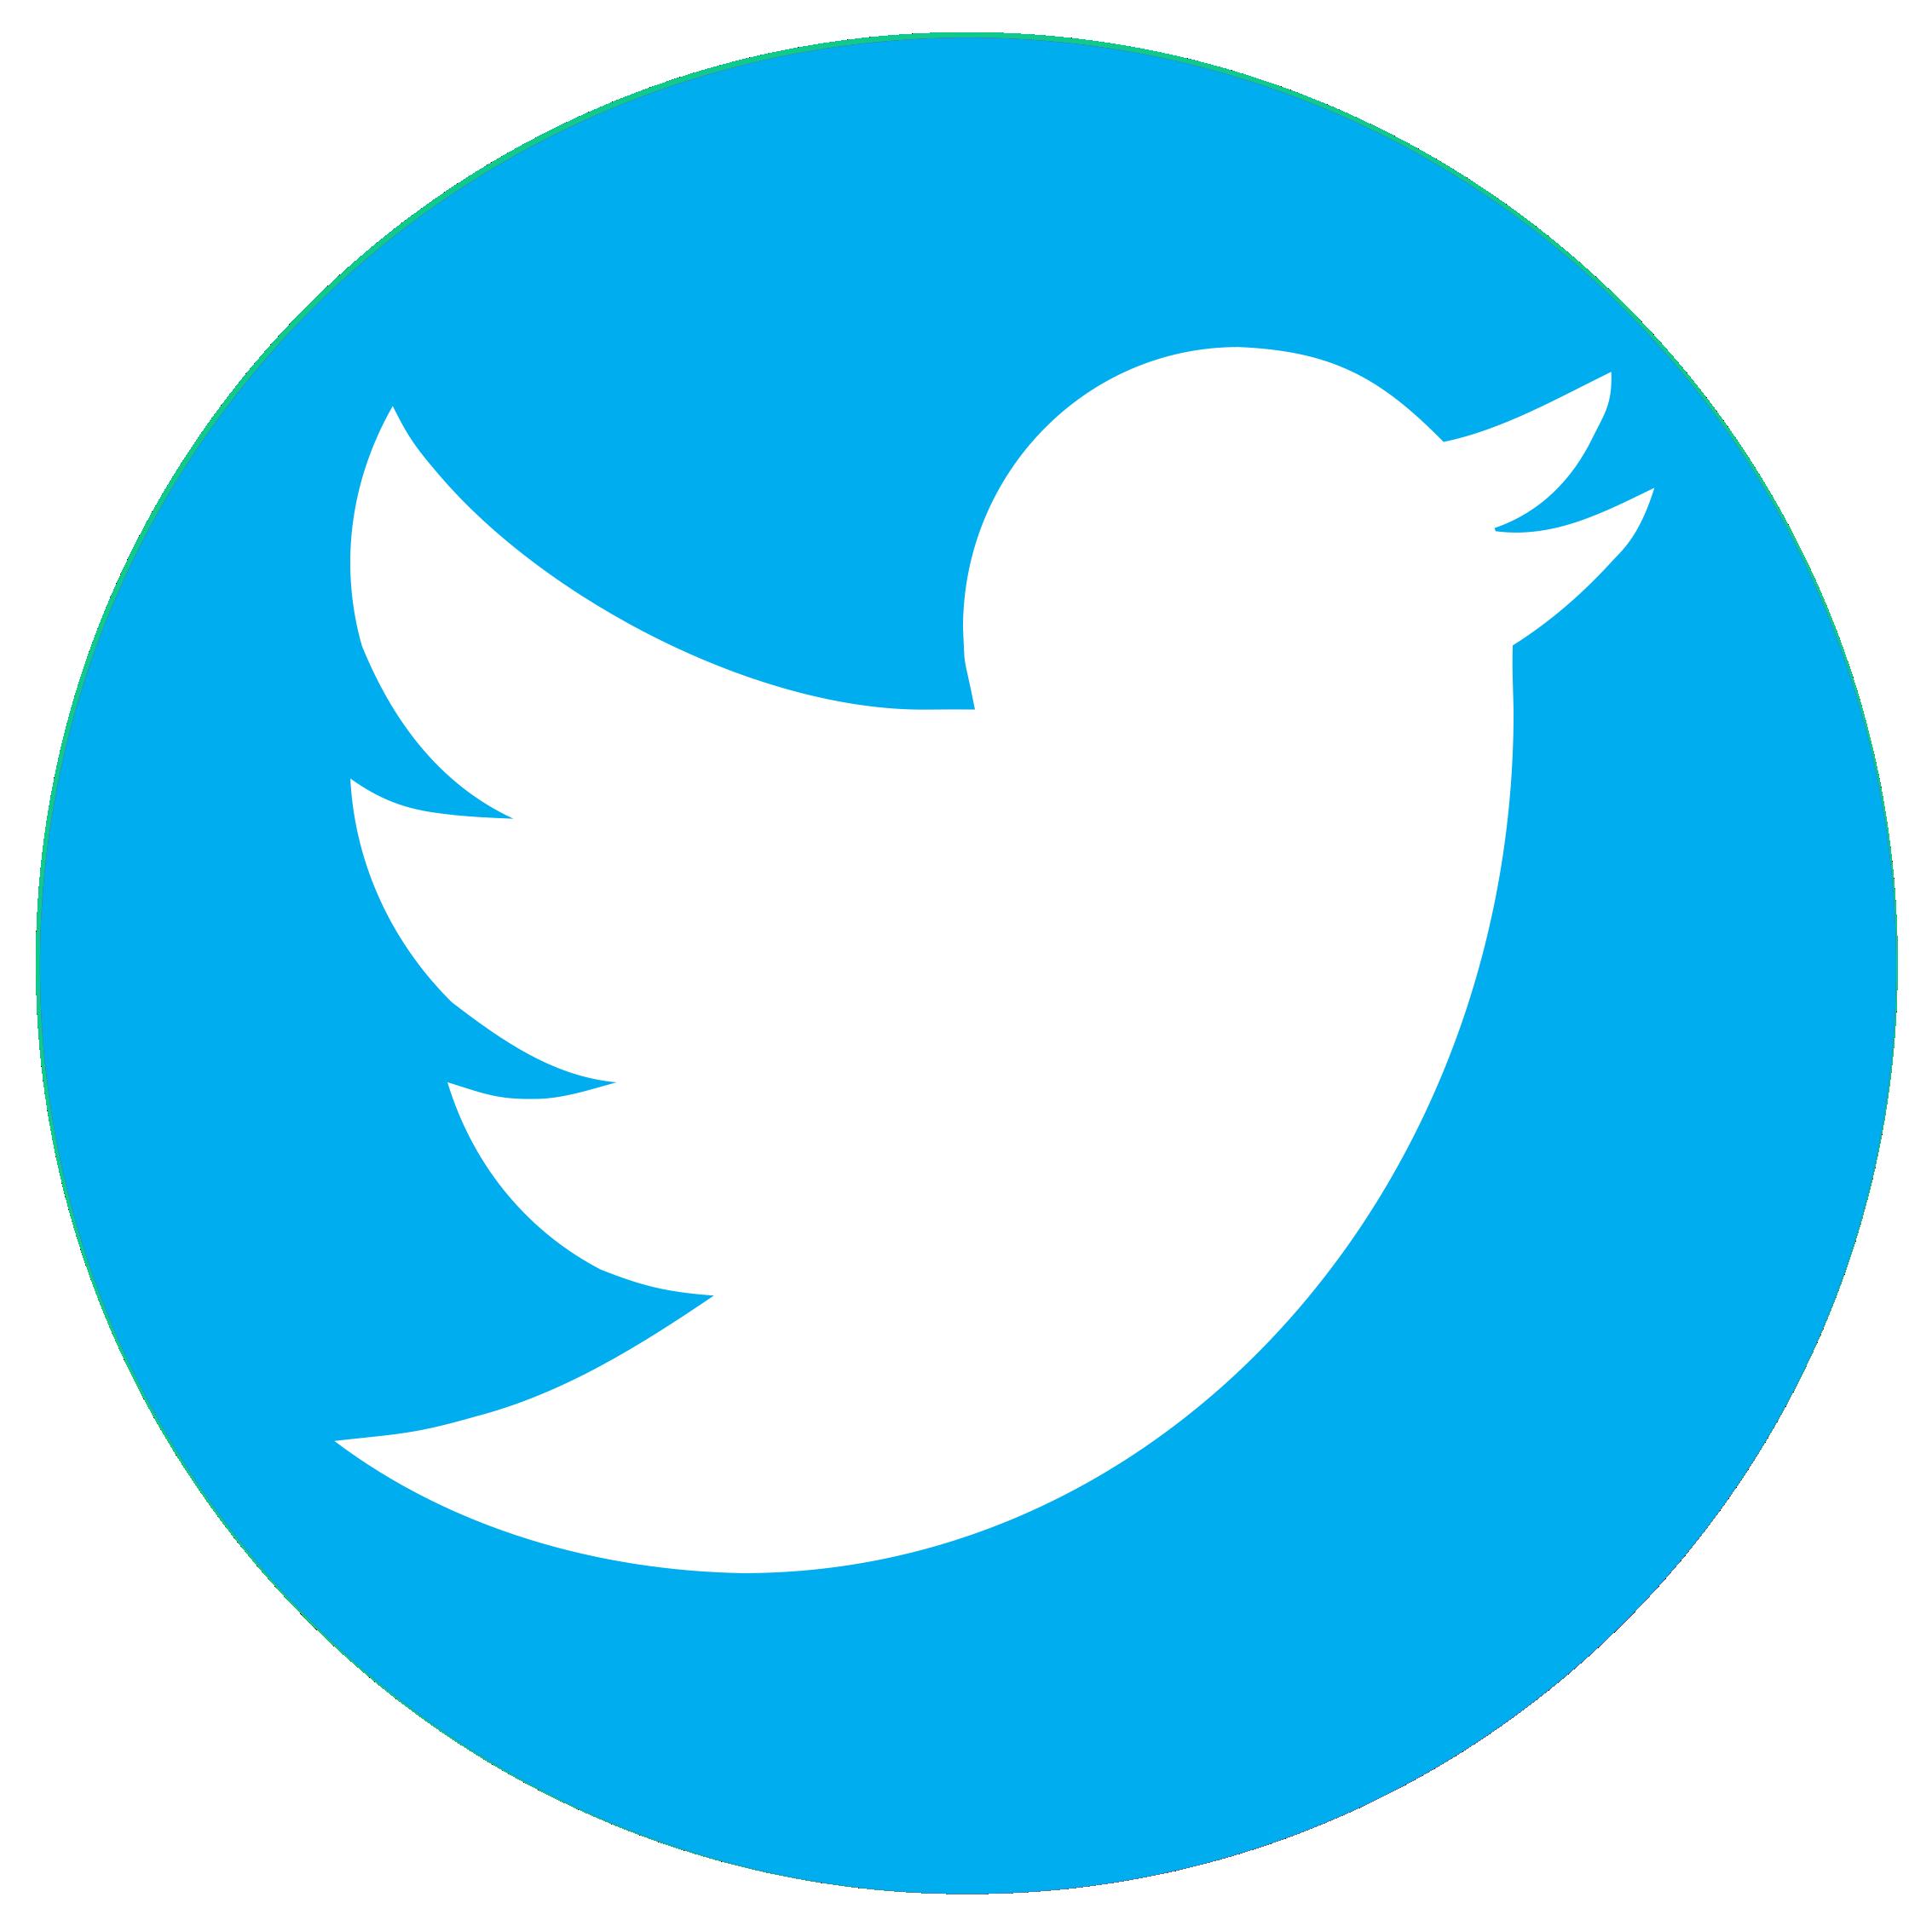 logo-twitter-circle-png-transparent-image-1.png